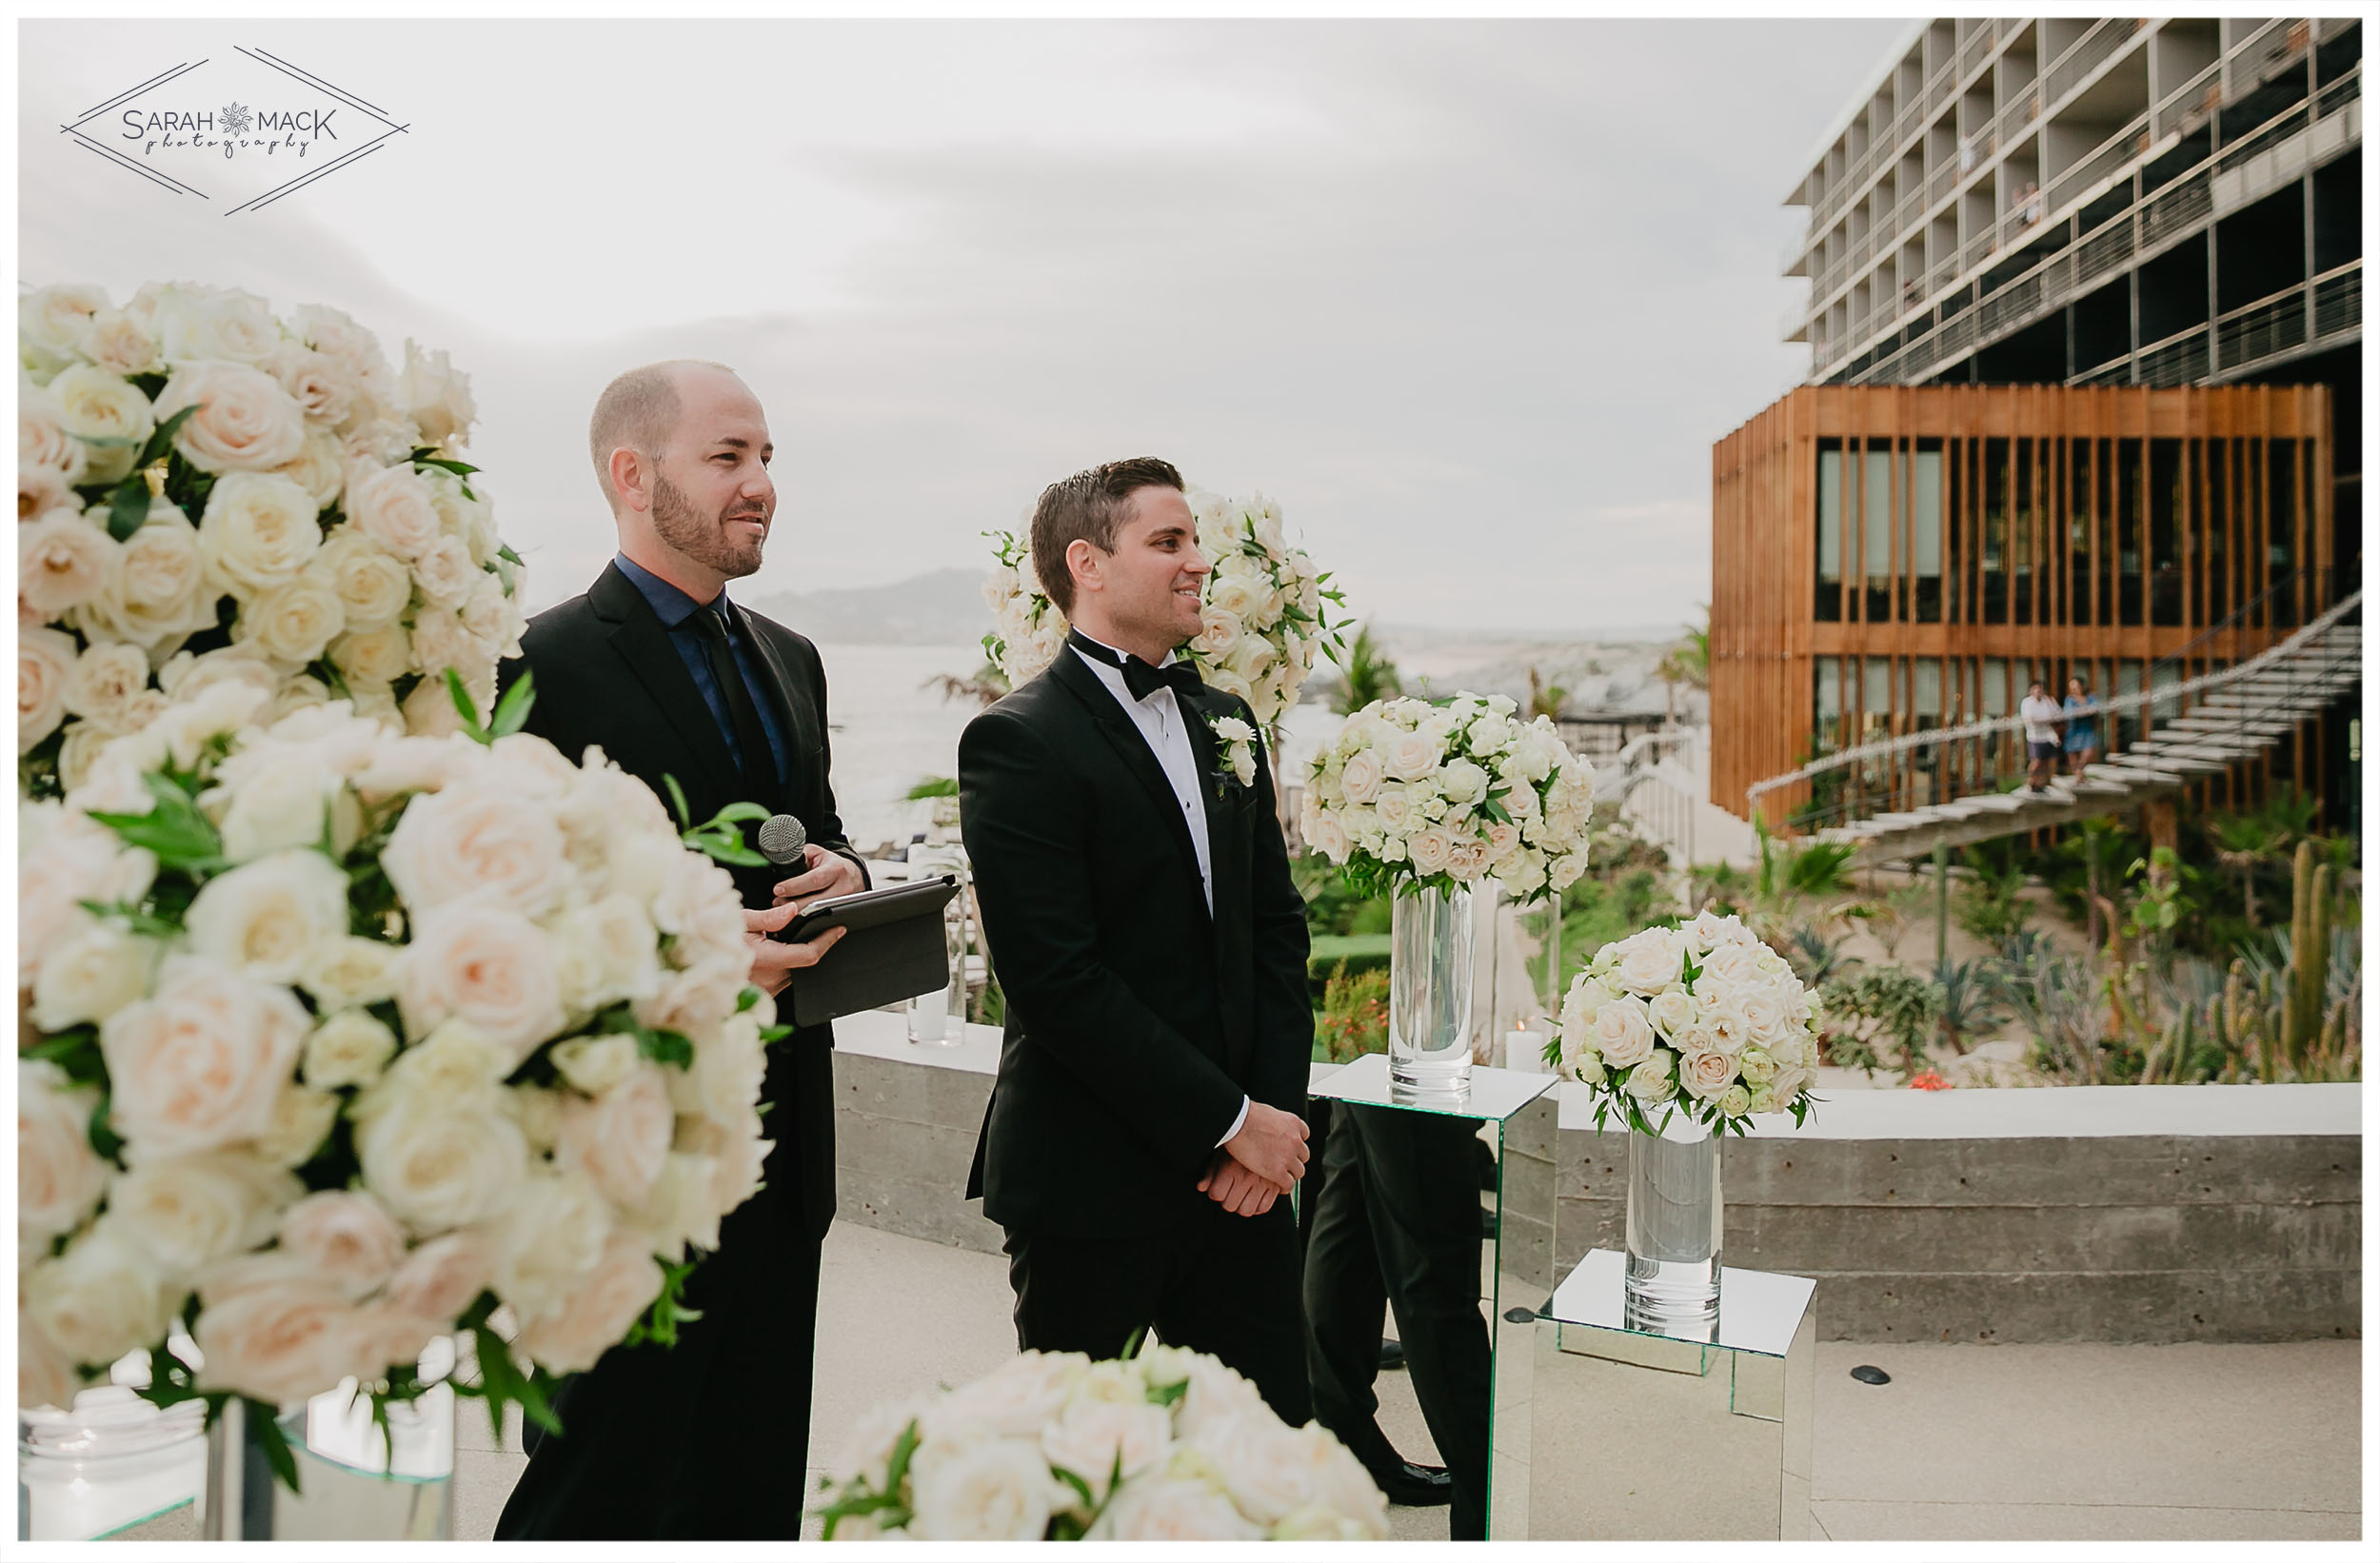 LJ-The-Cape-Hotel-Cabo-San-Lucas-Wedding-29.jpg